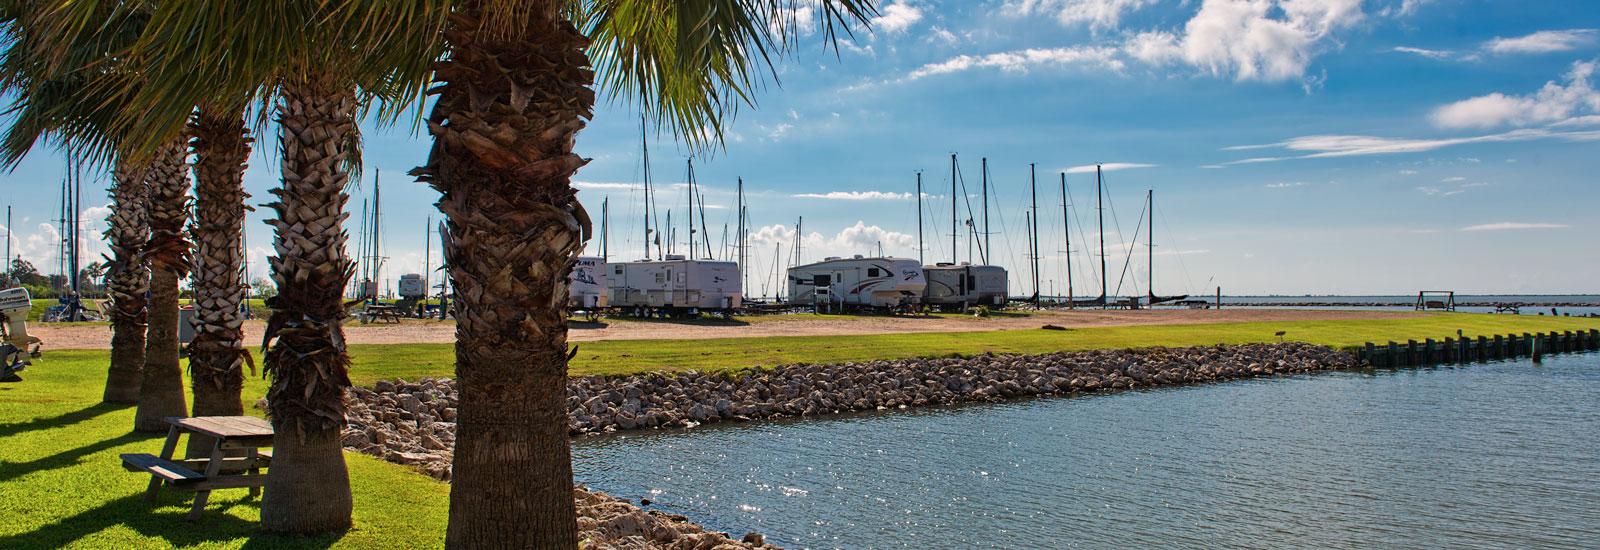 Serendipity Bay Resort in Palacios, TX